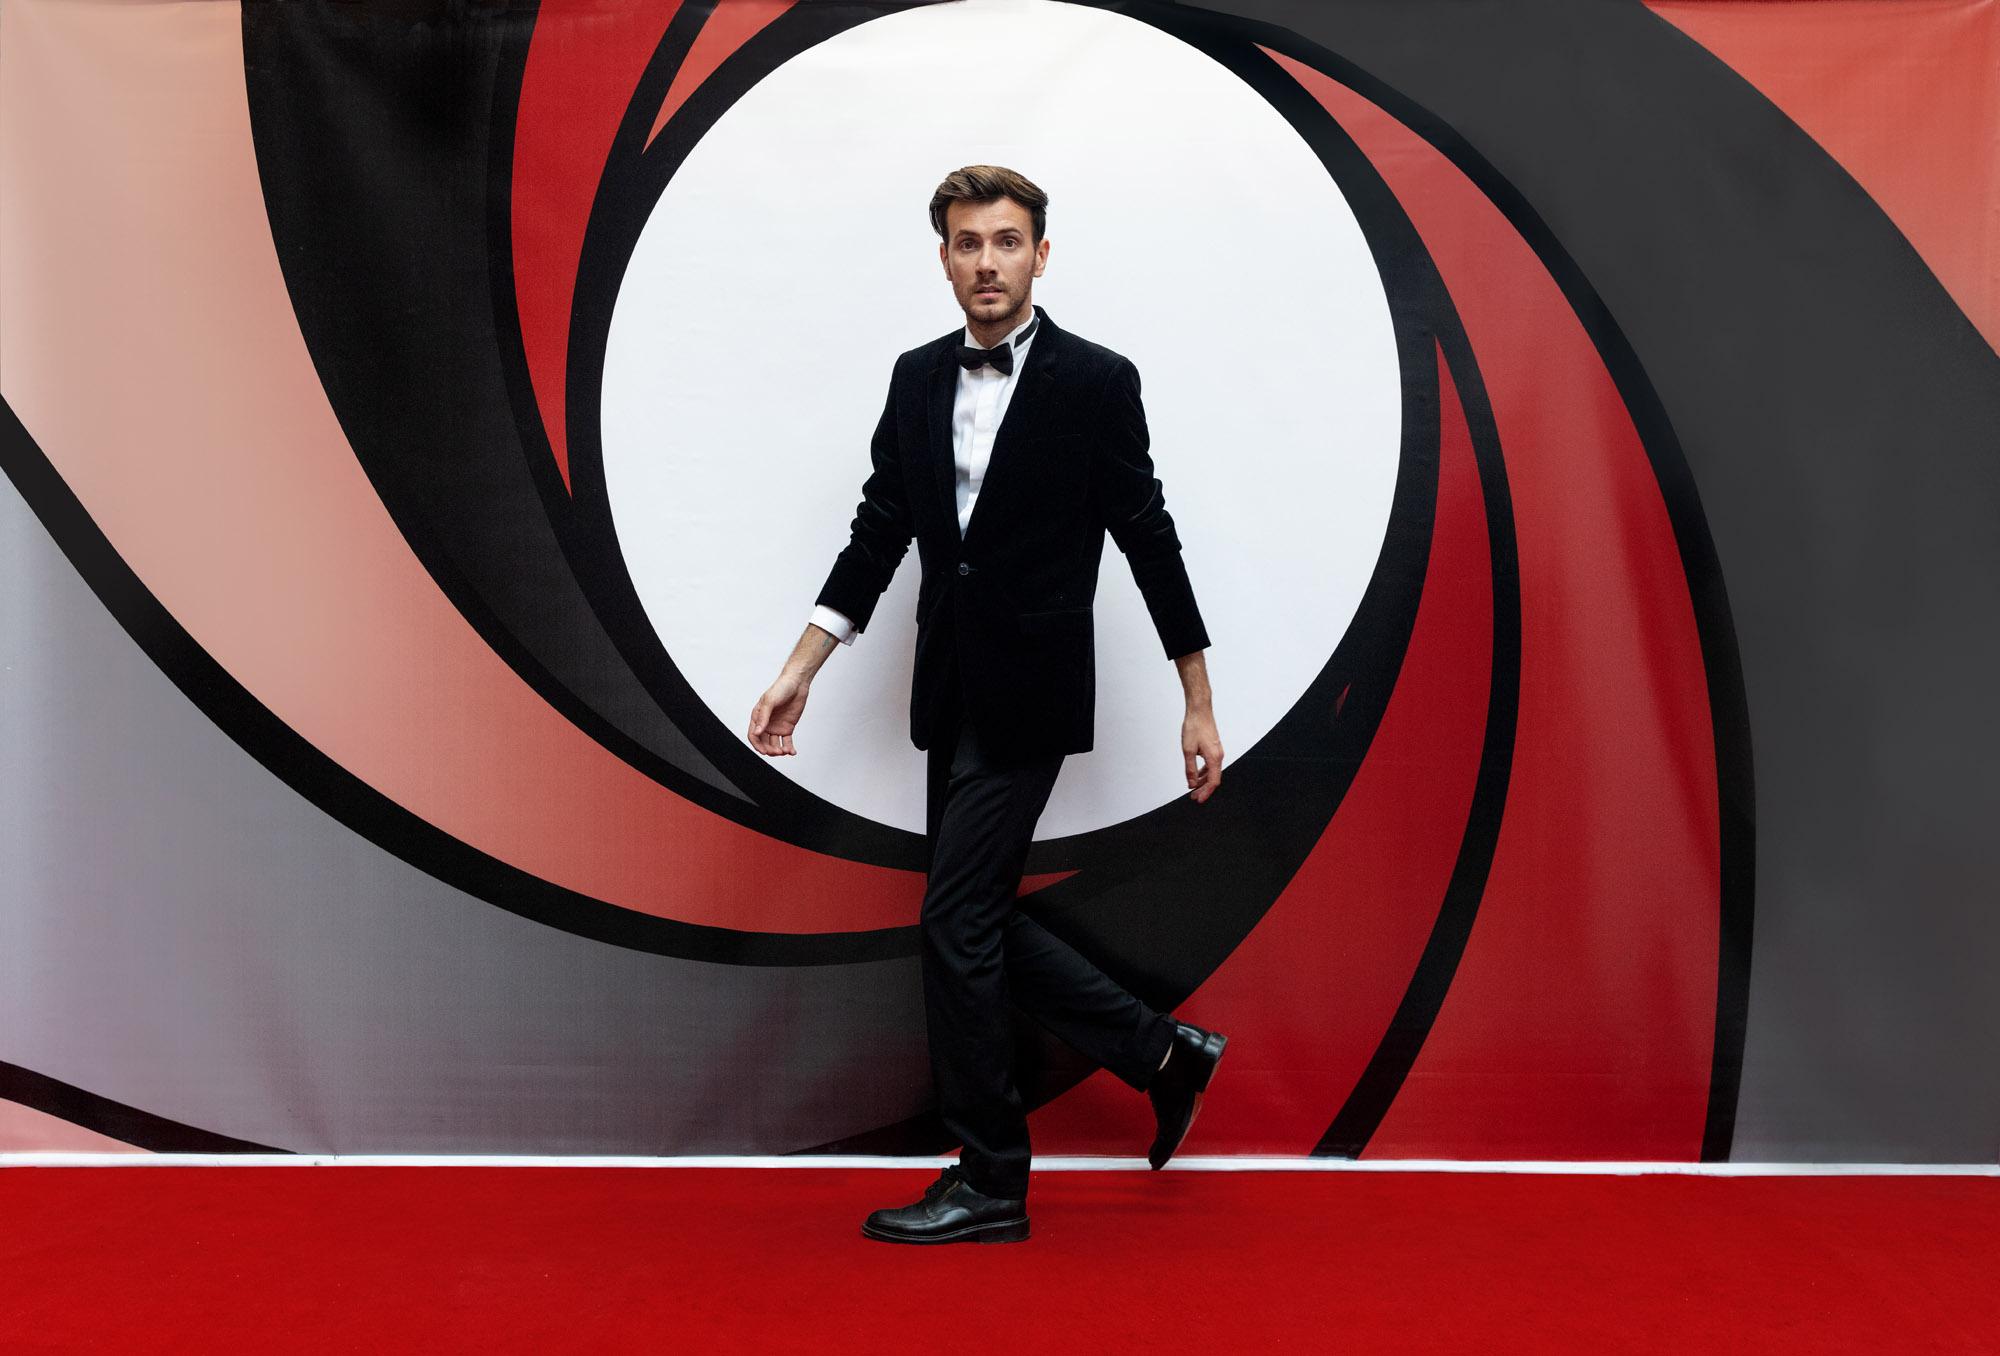 Fundal James Bond, inchiriere decor petrecere tematica